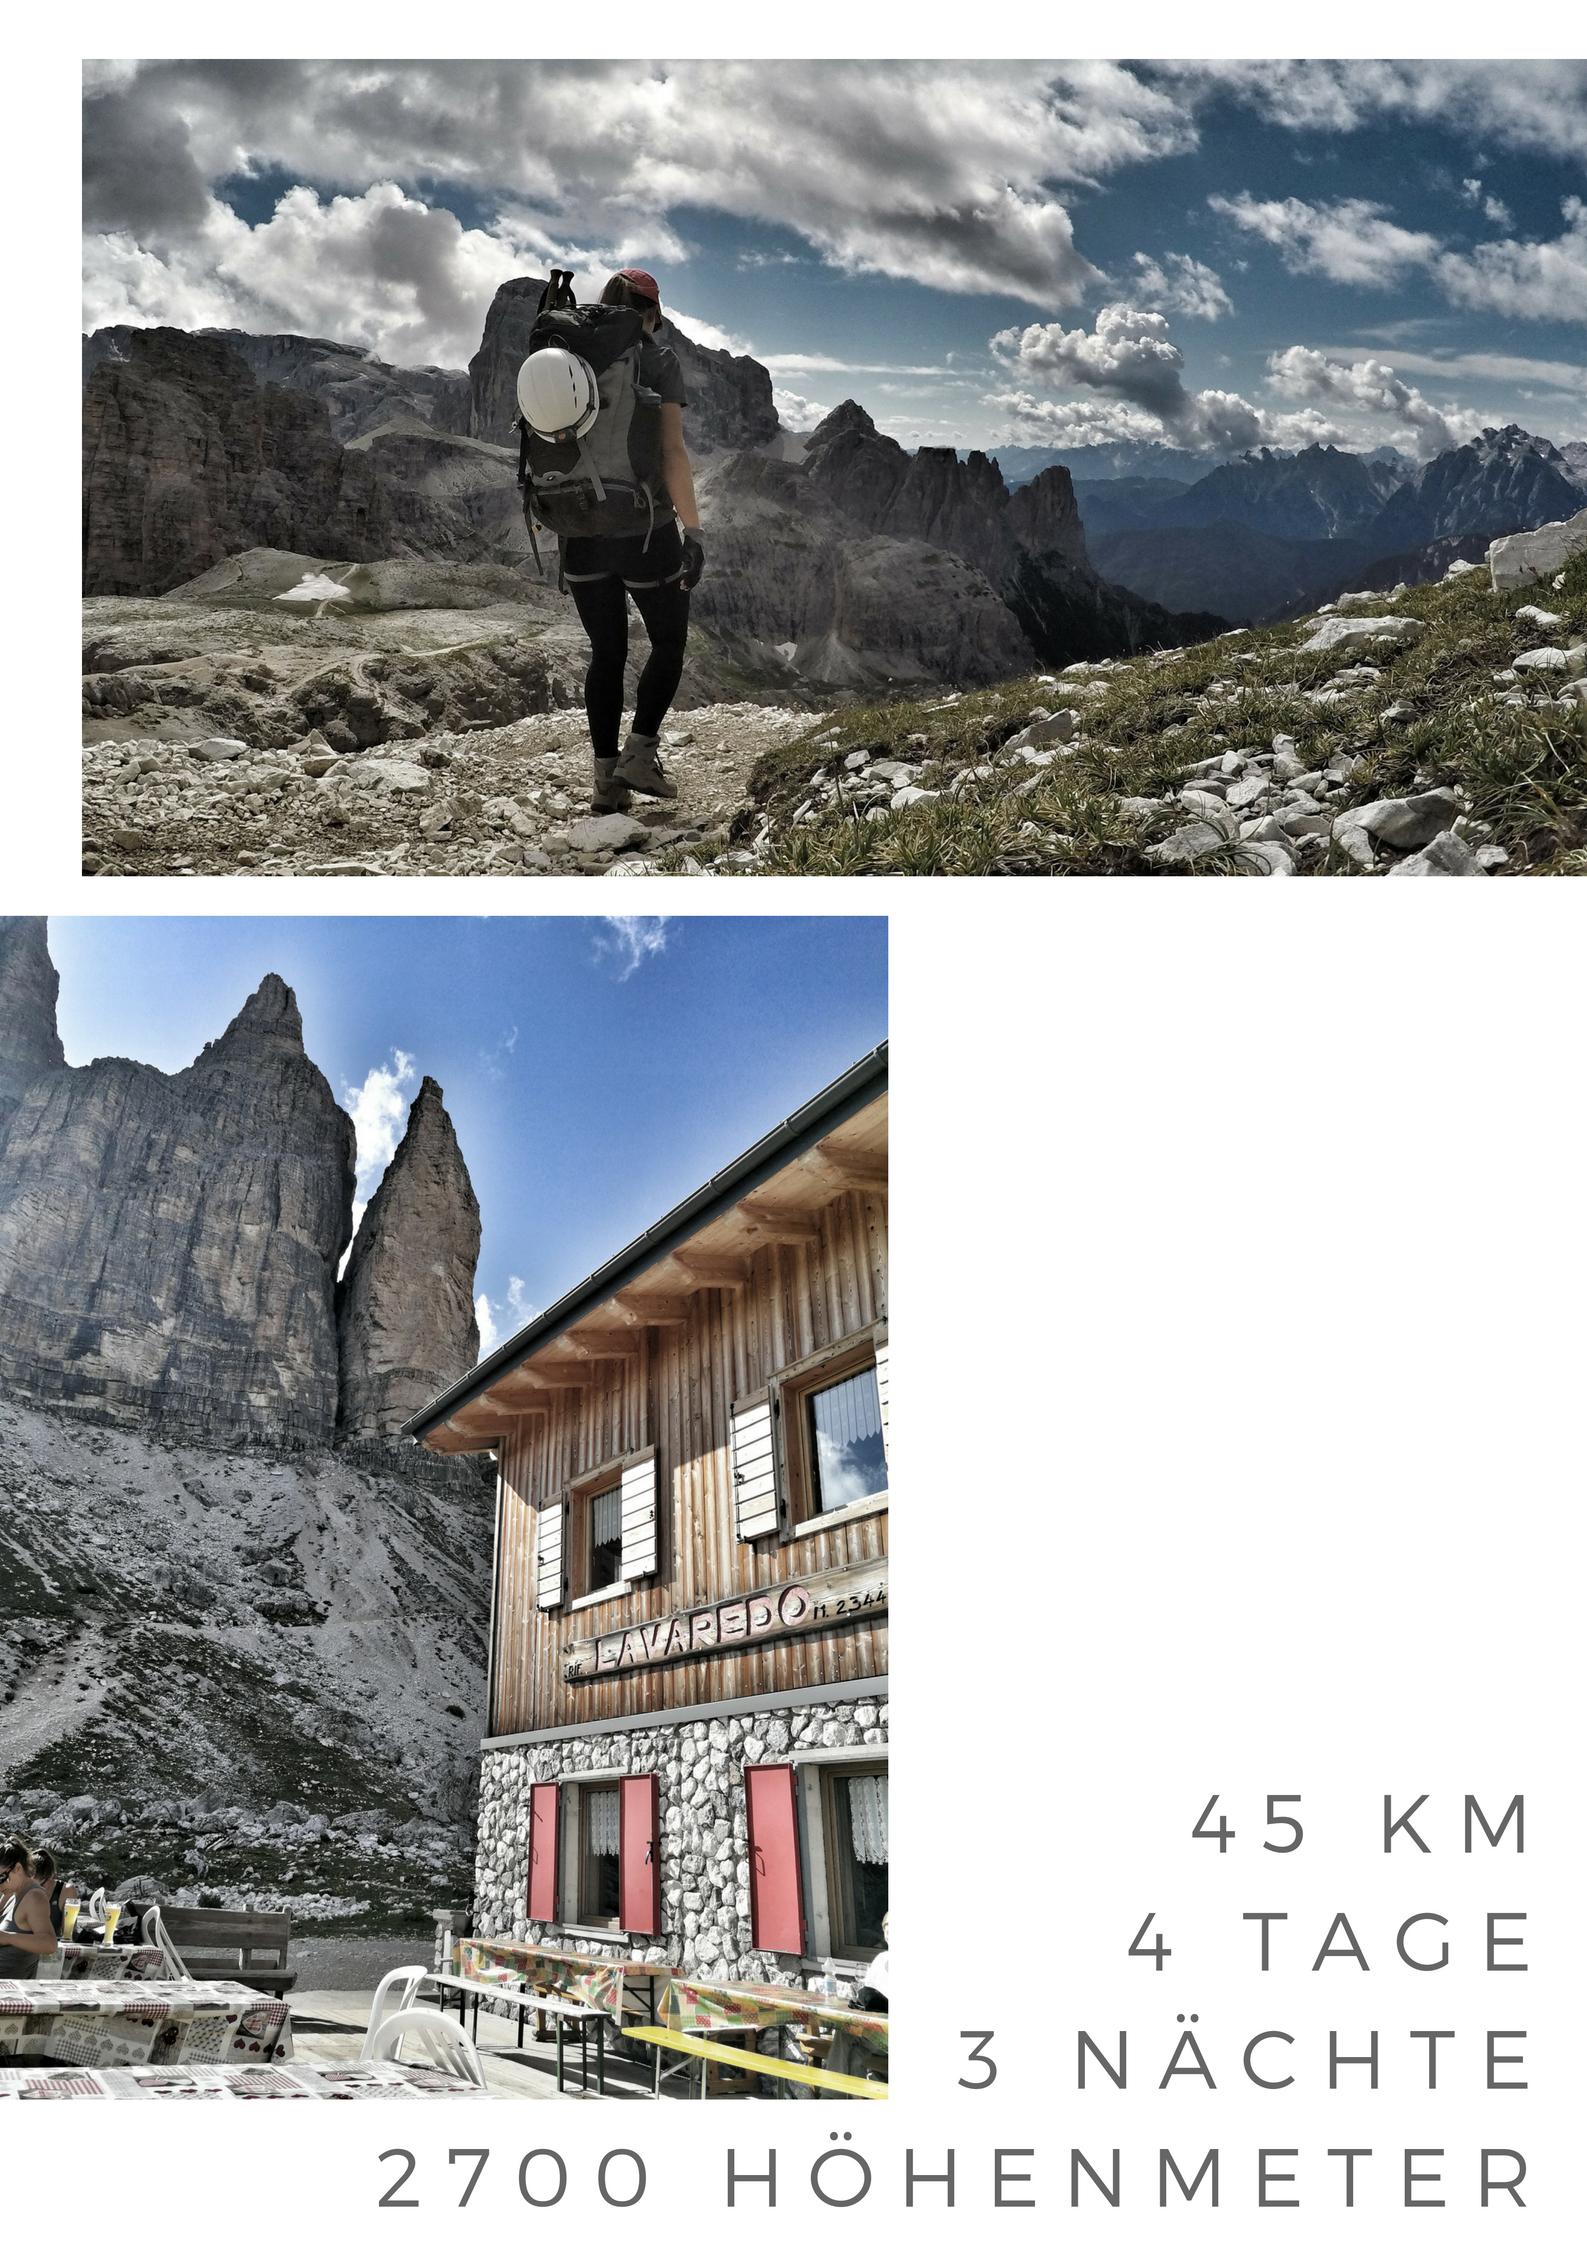 Klettersteig-Dolomiten-2.jpg